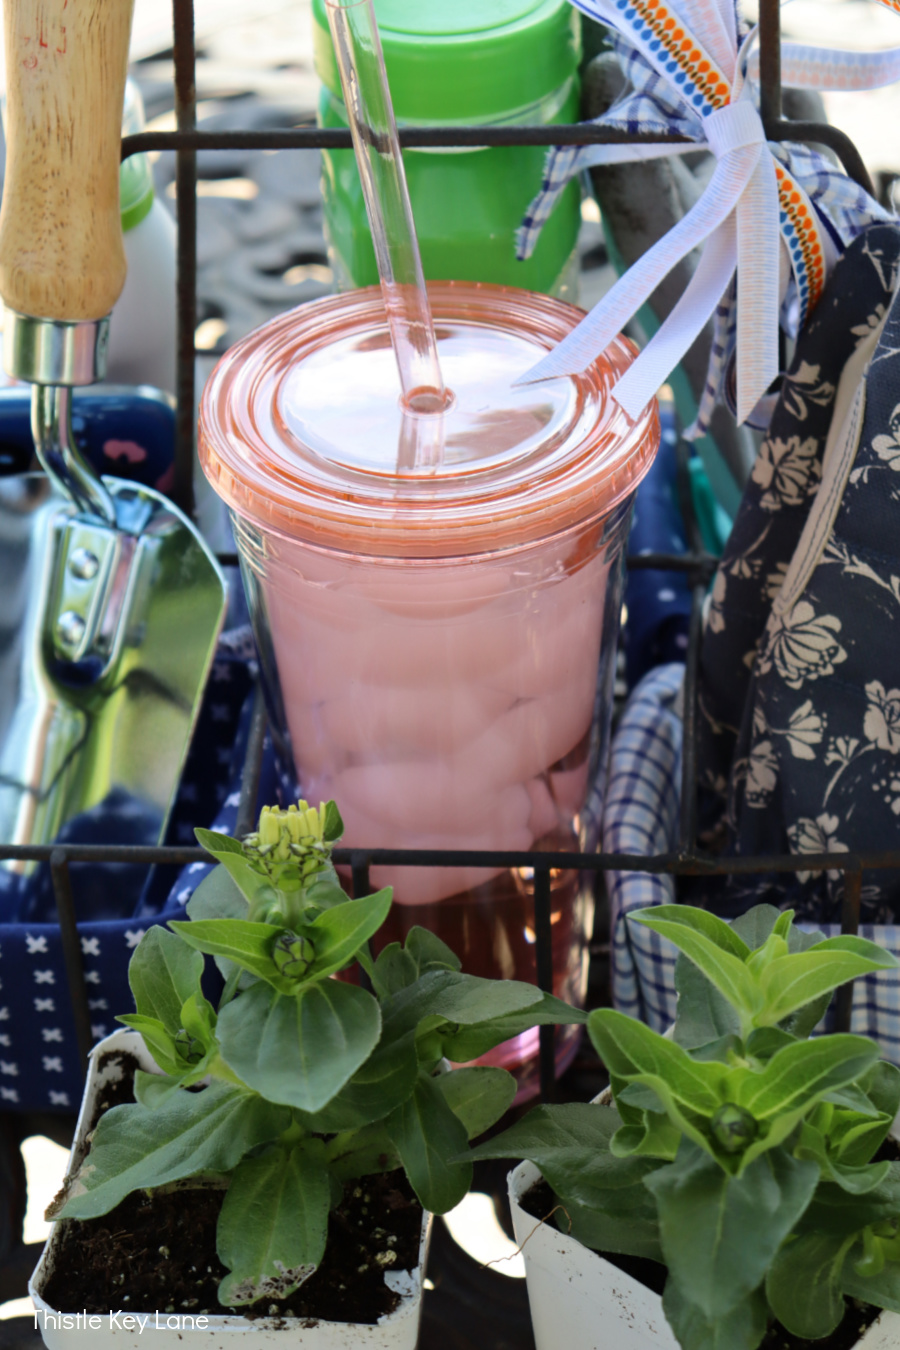 Peach drink tumbler on DIY garden tool caddy.